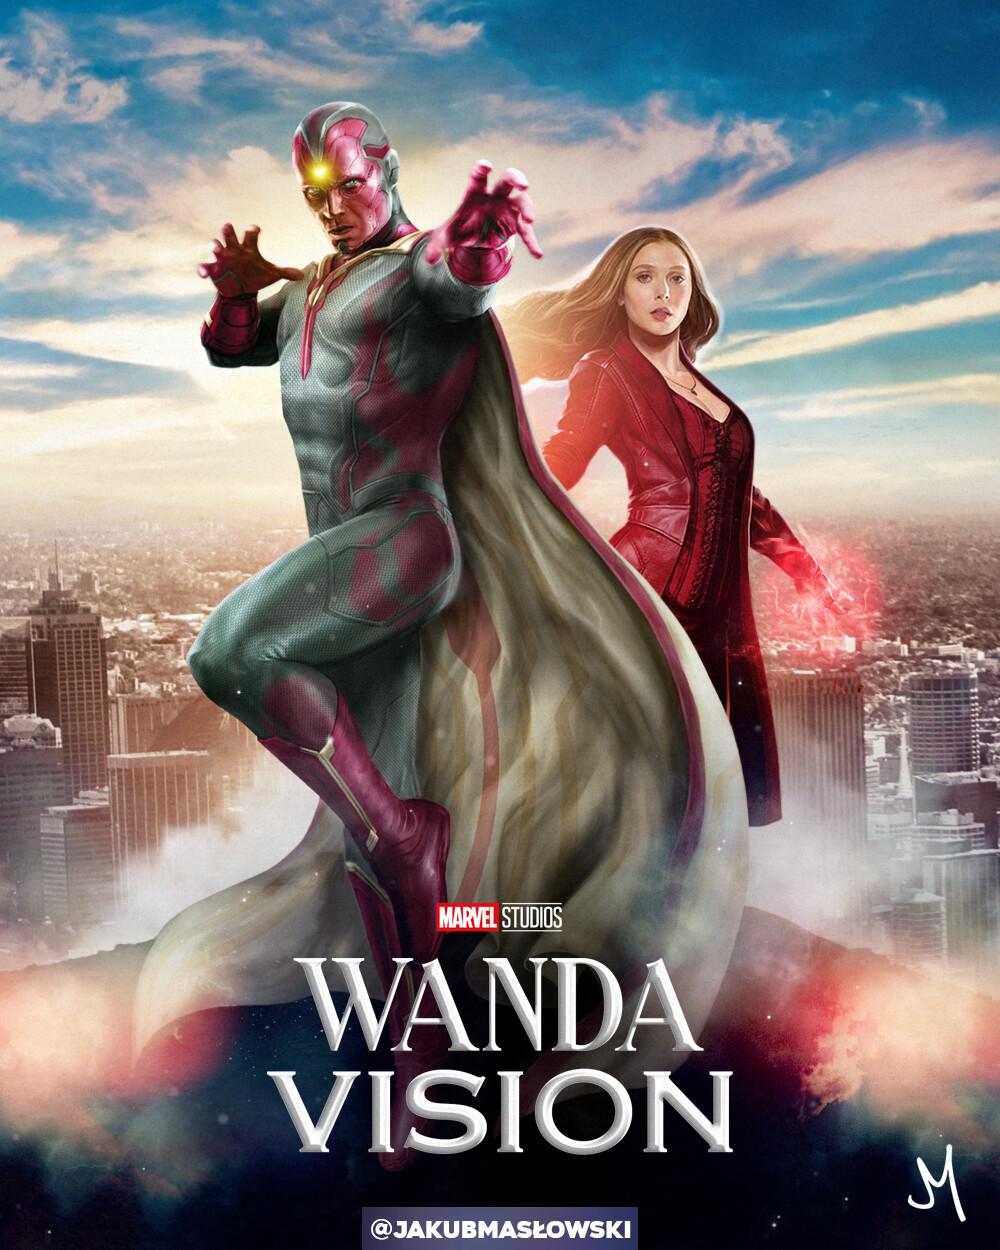 Wanda Vision - Vietsub Thuyết Minh (2021)